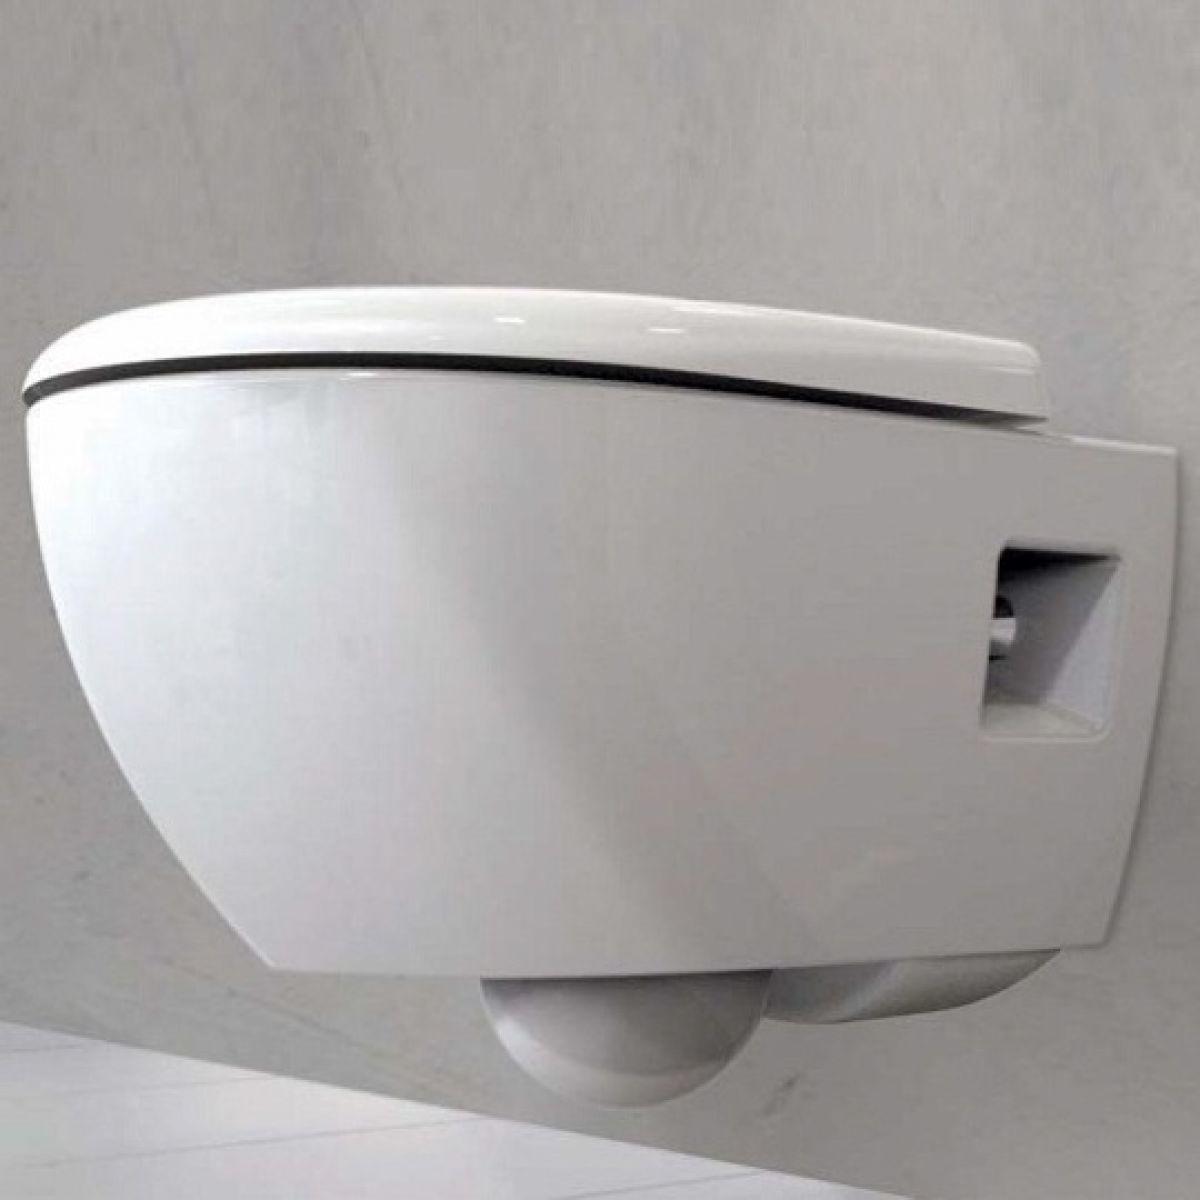 Geberit Smyle Round Rimfree Wall Hung Toilet Uk Bathrooms